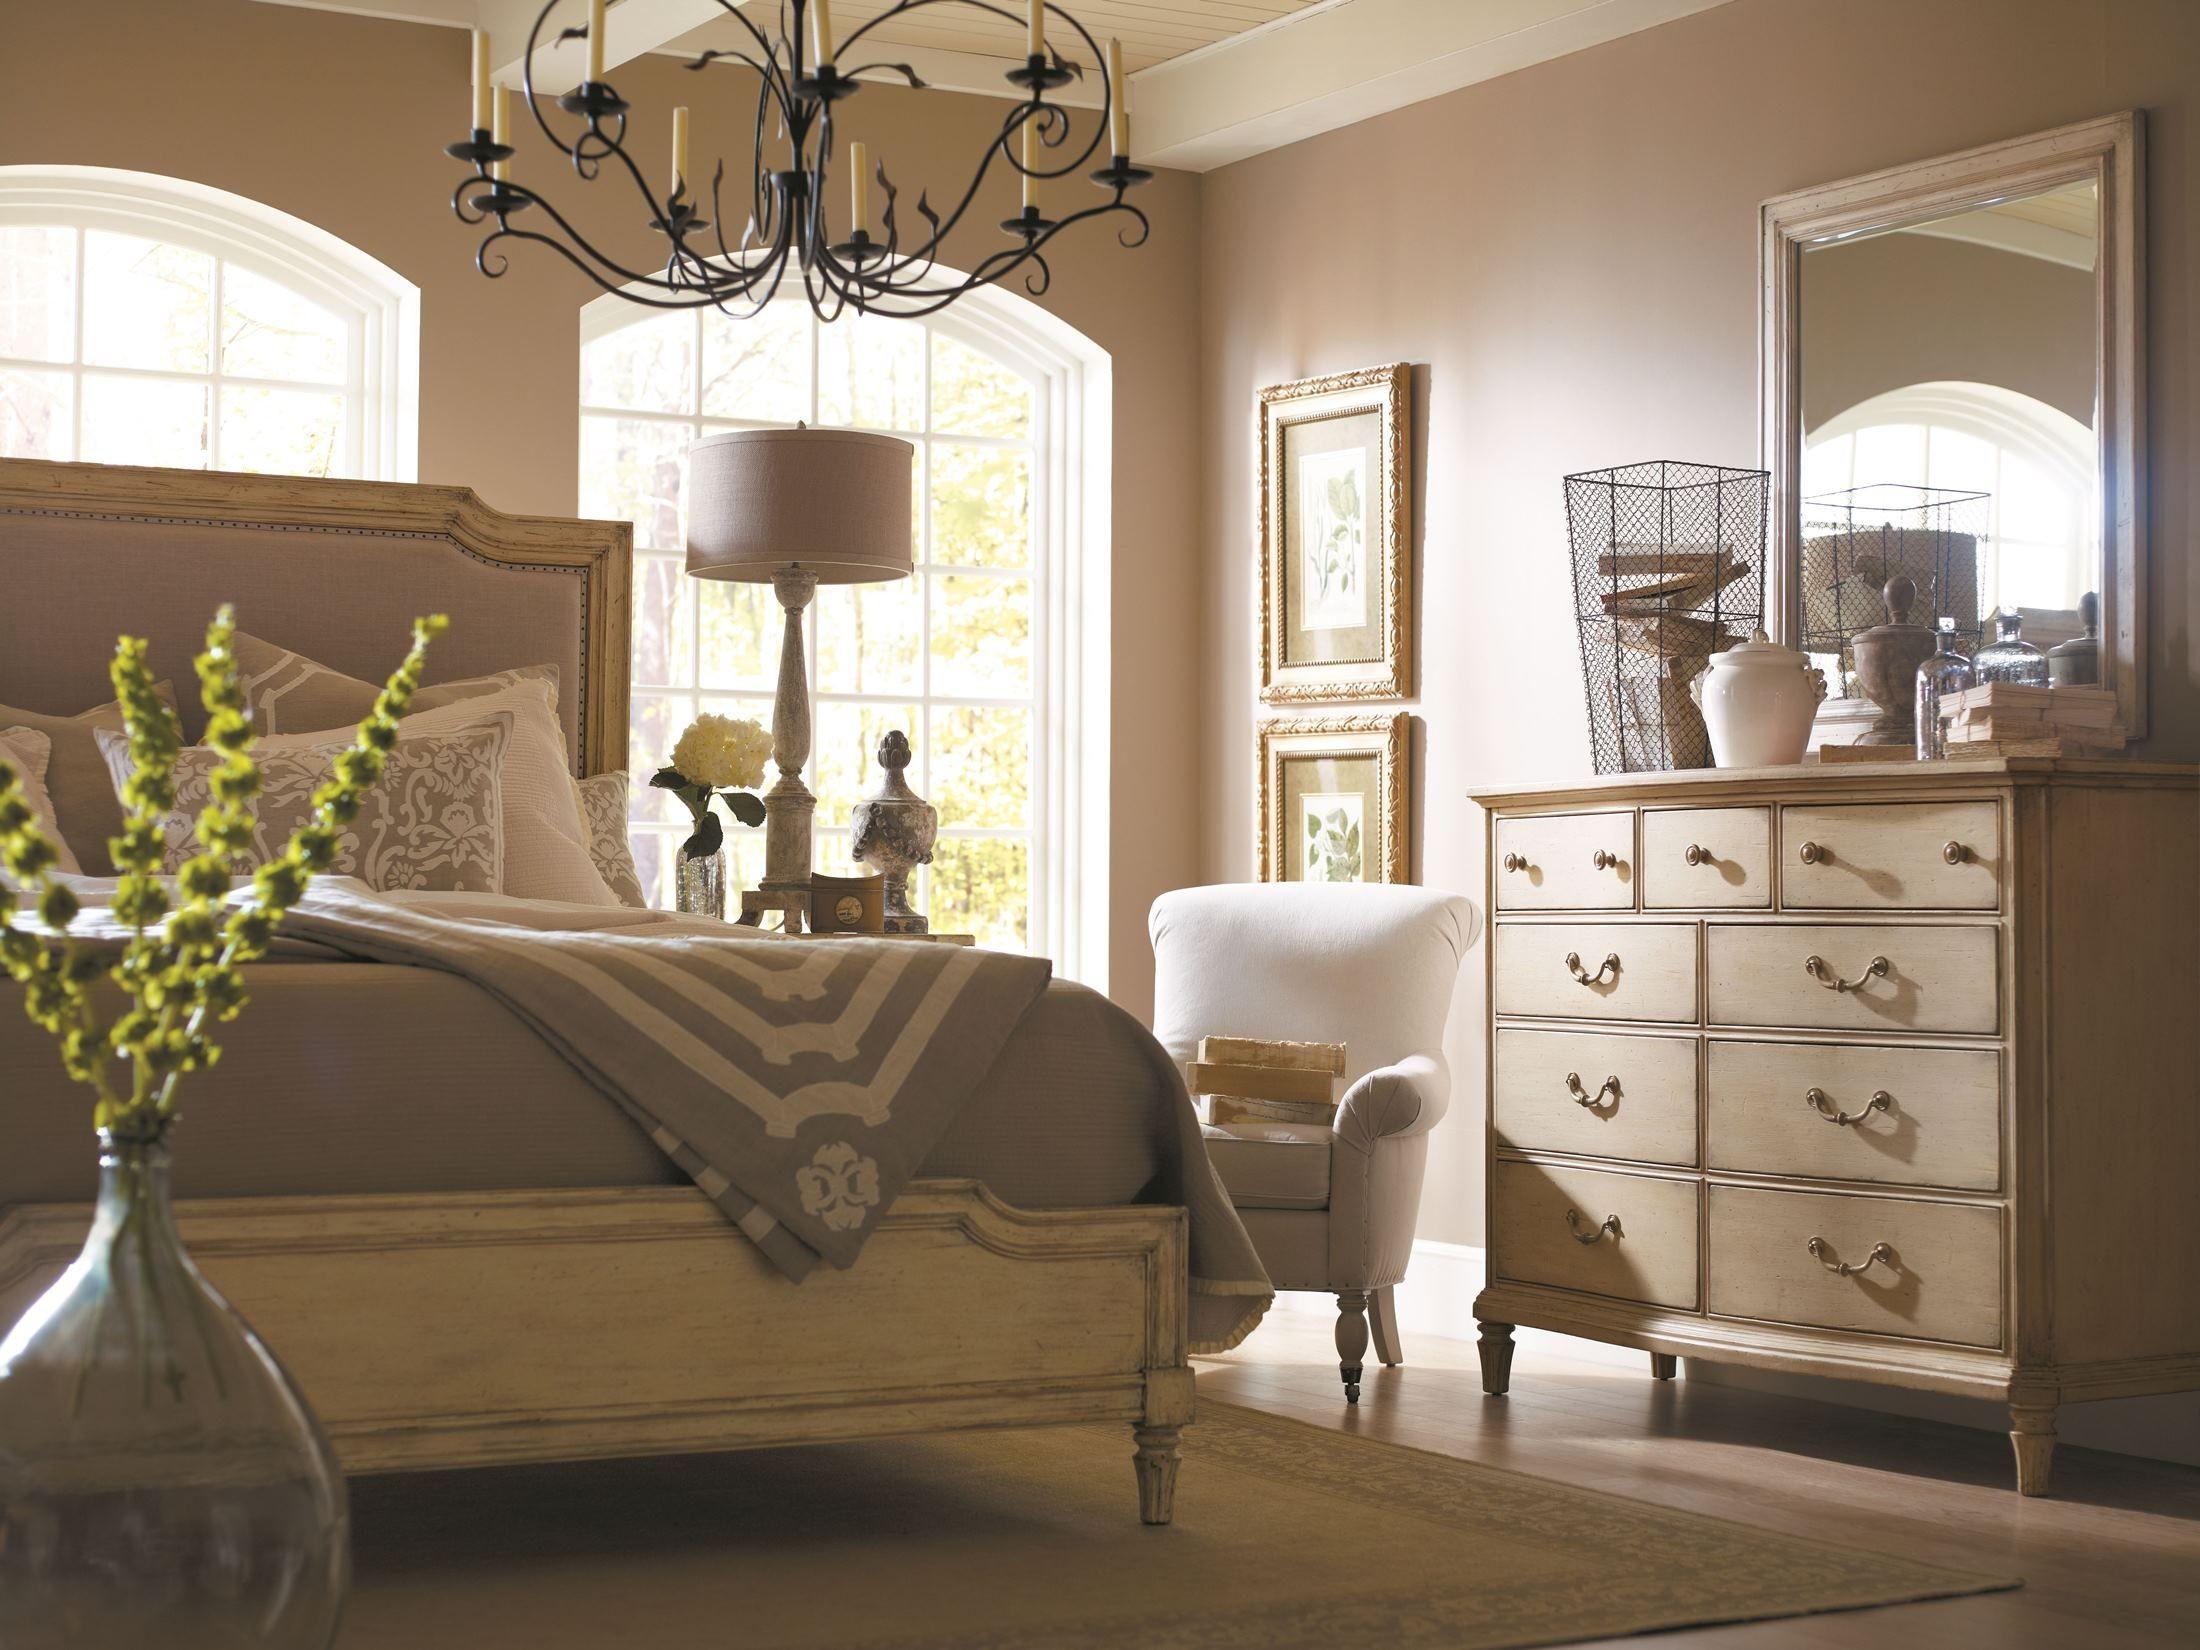 European Cottage Vintage White Upholstered Bedroom Set from Stanley 007 23 5